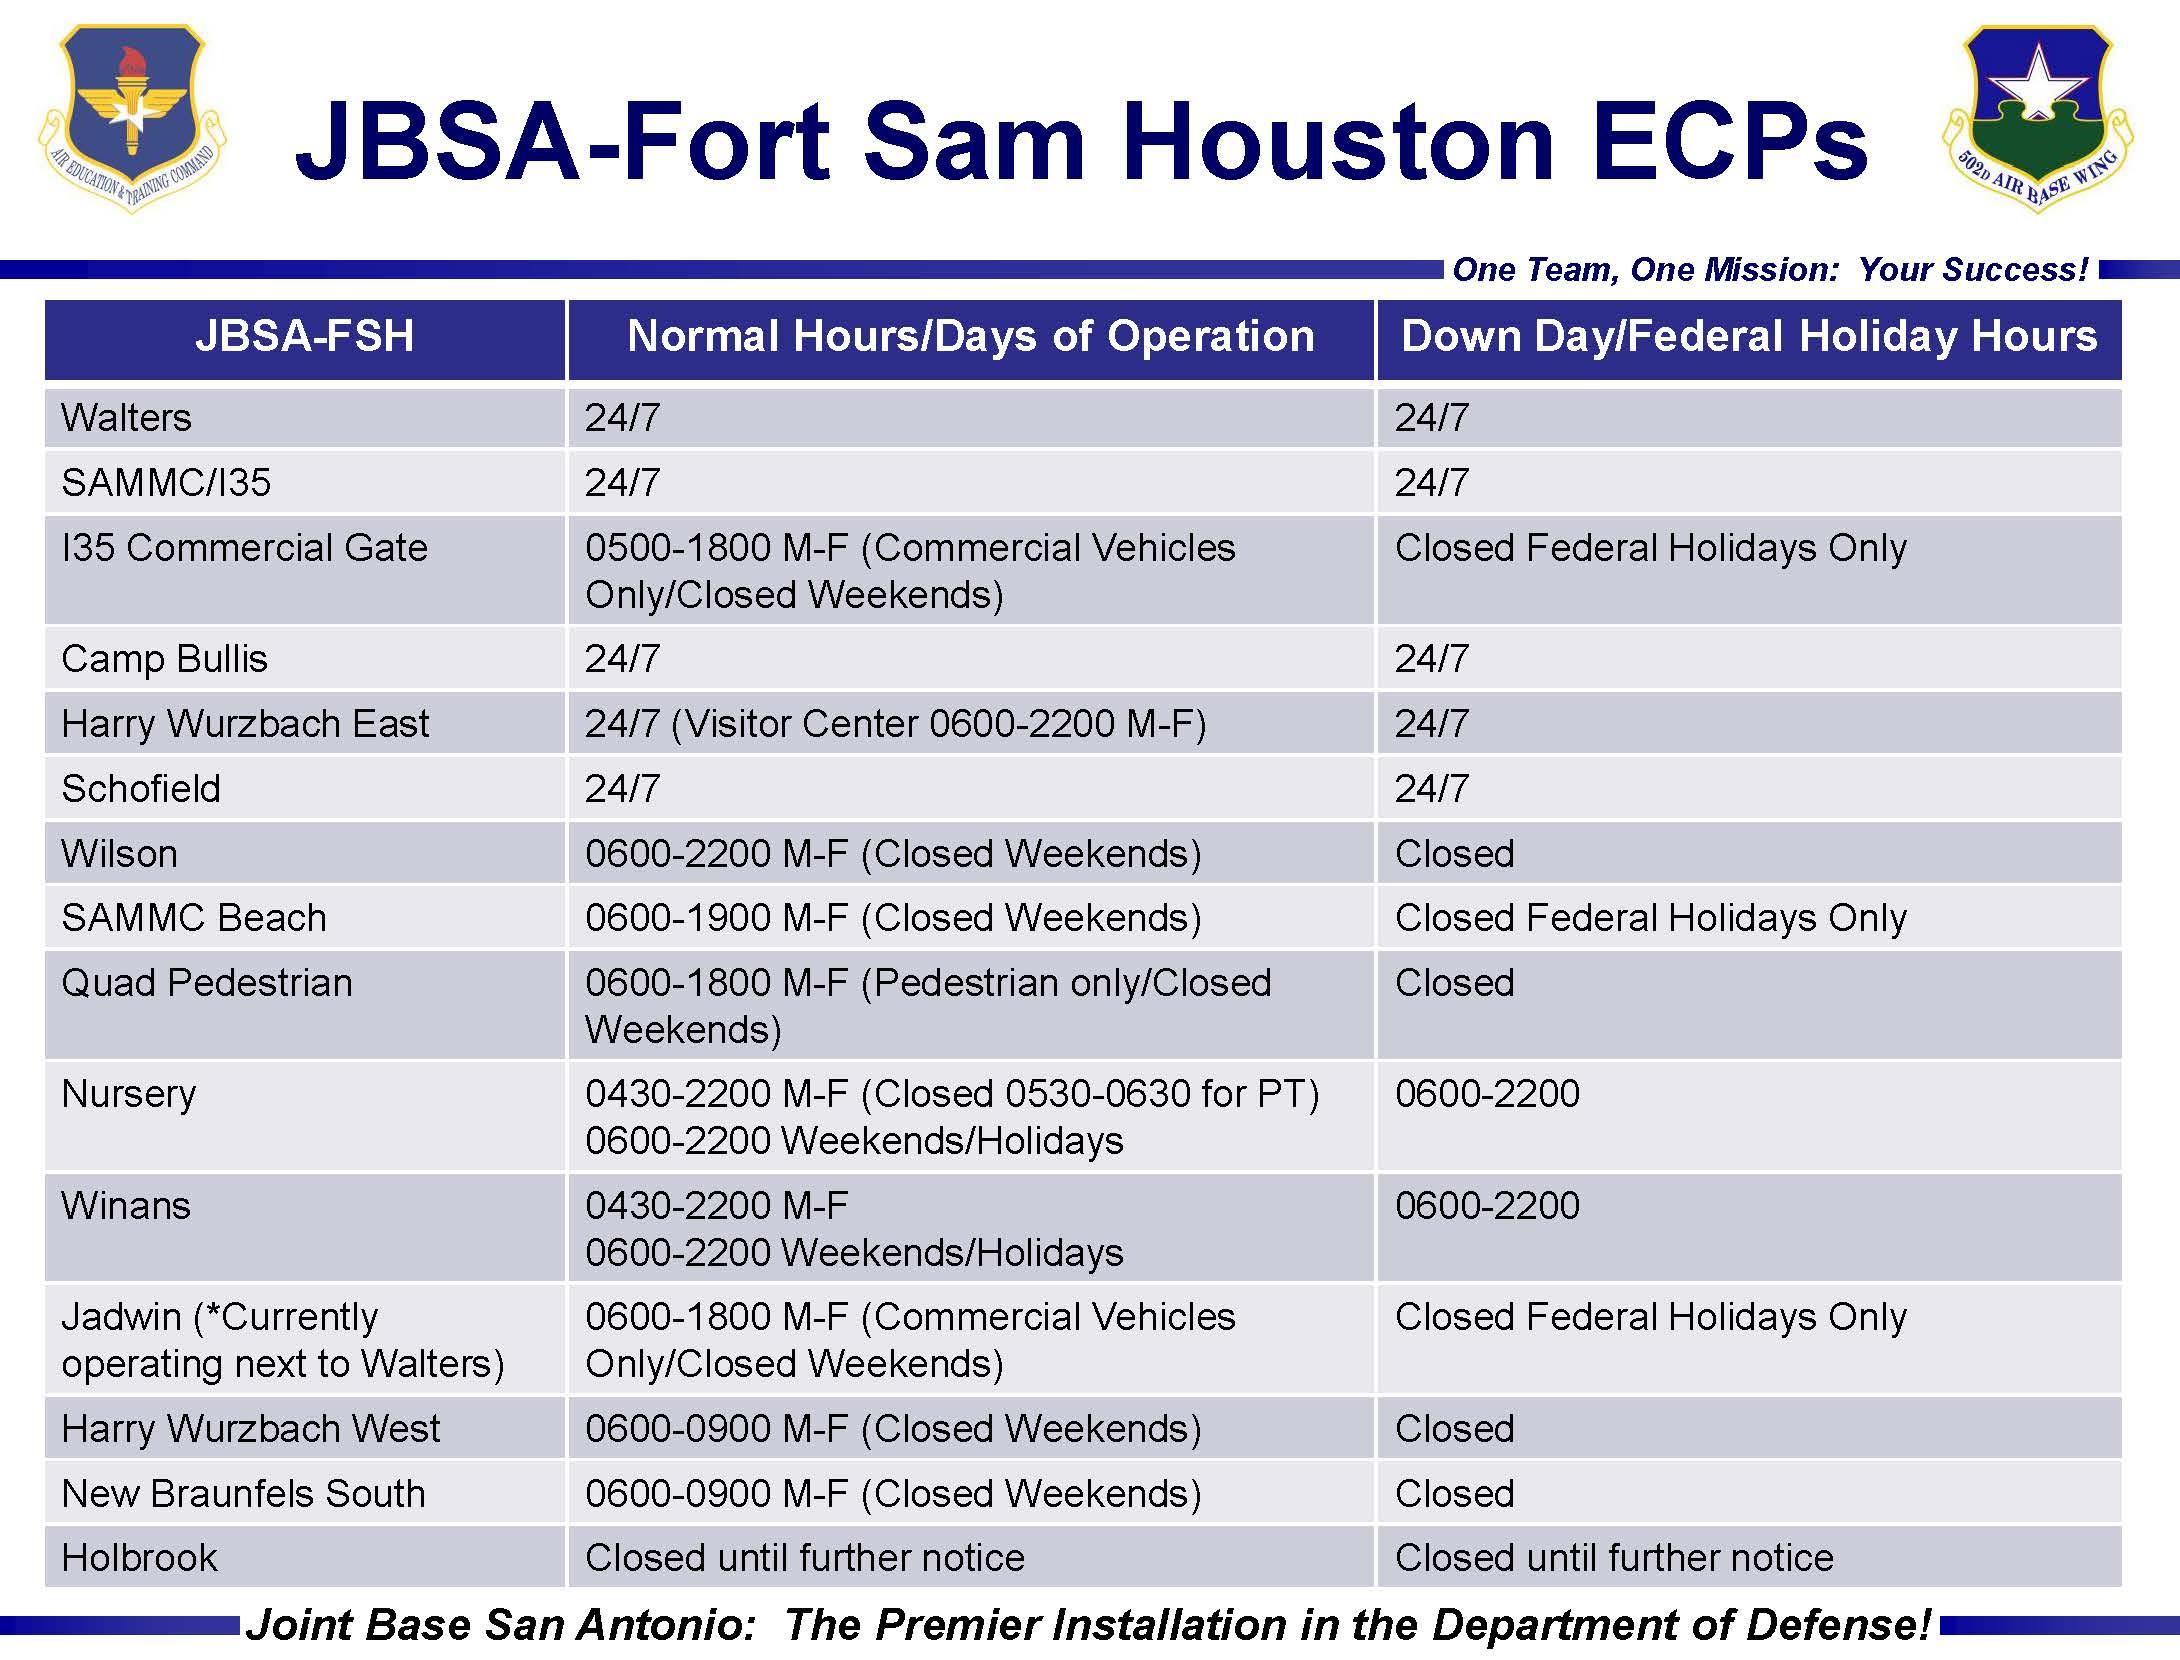 Army Pa Program >> Joint Base San Antonio-Fort Sam Houston Entry Control ...